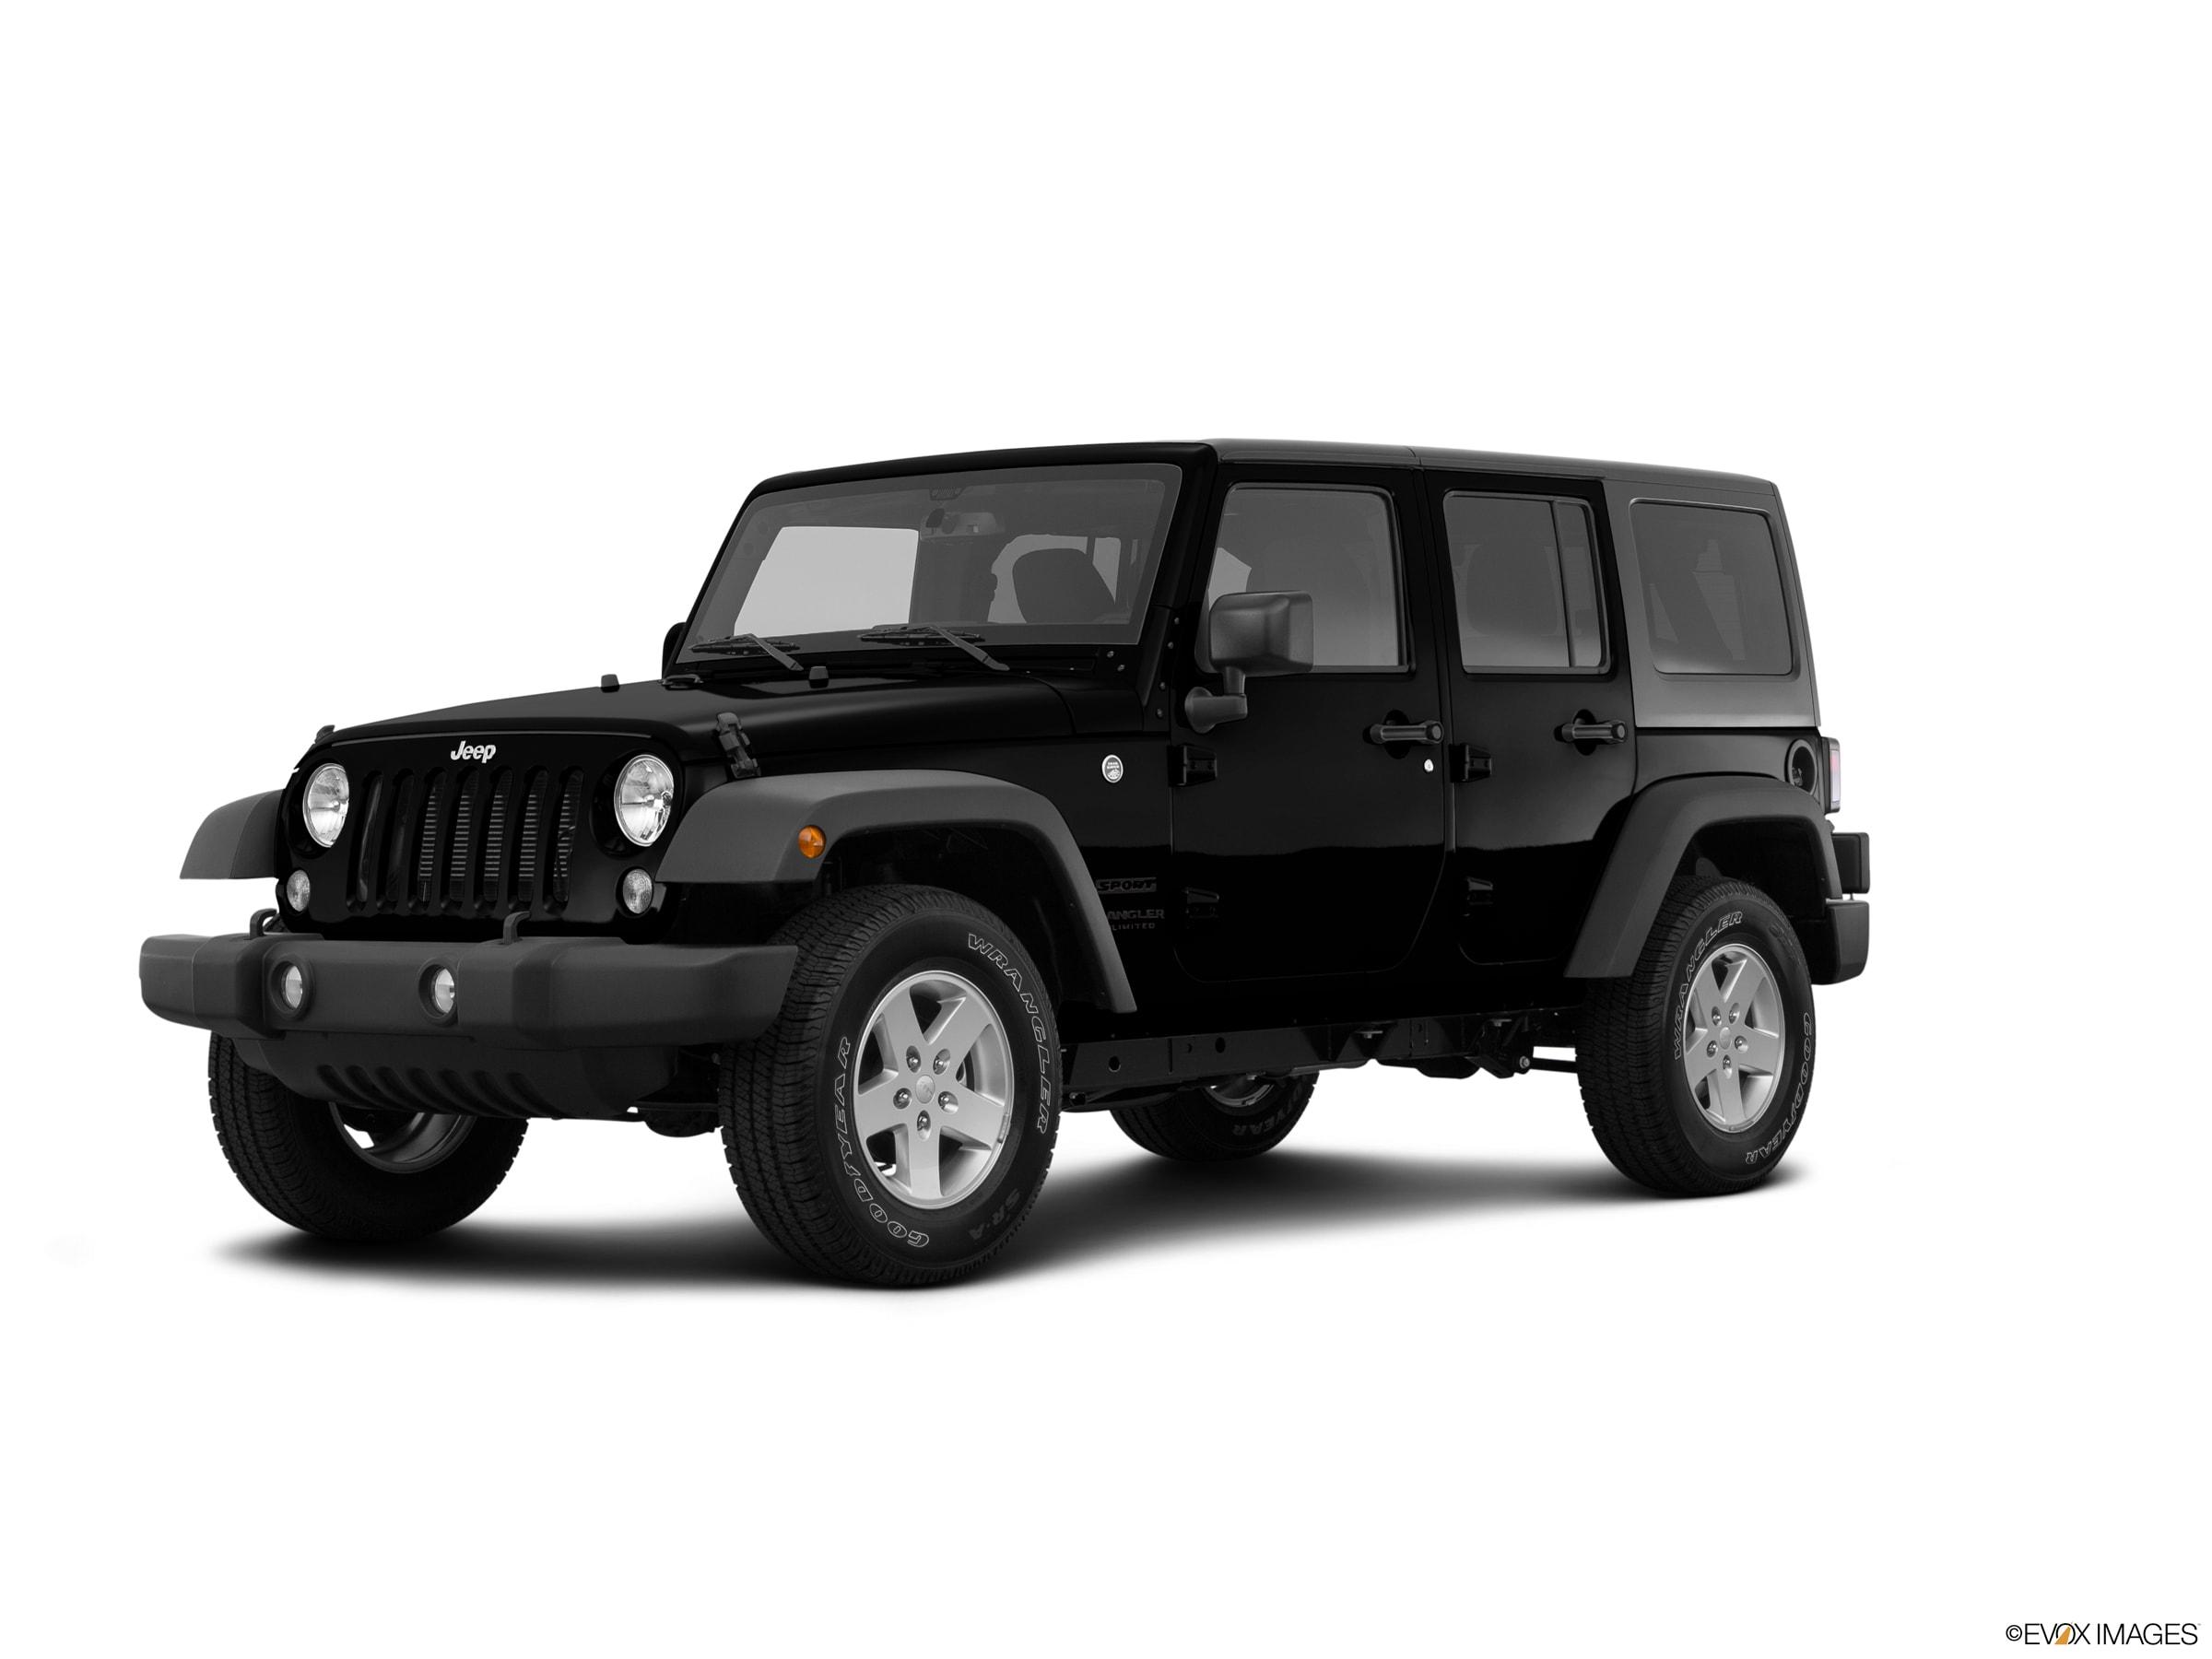 Used 2016 Jeep Wrangler Unlimited For Sale At Rydell Chrysler Dodge Jeep Ram Vin 1c4bjwdg5gl292205